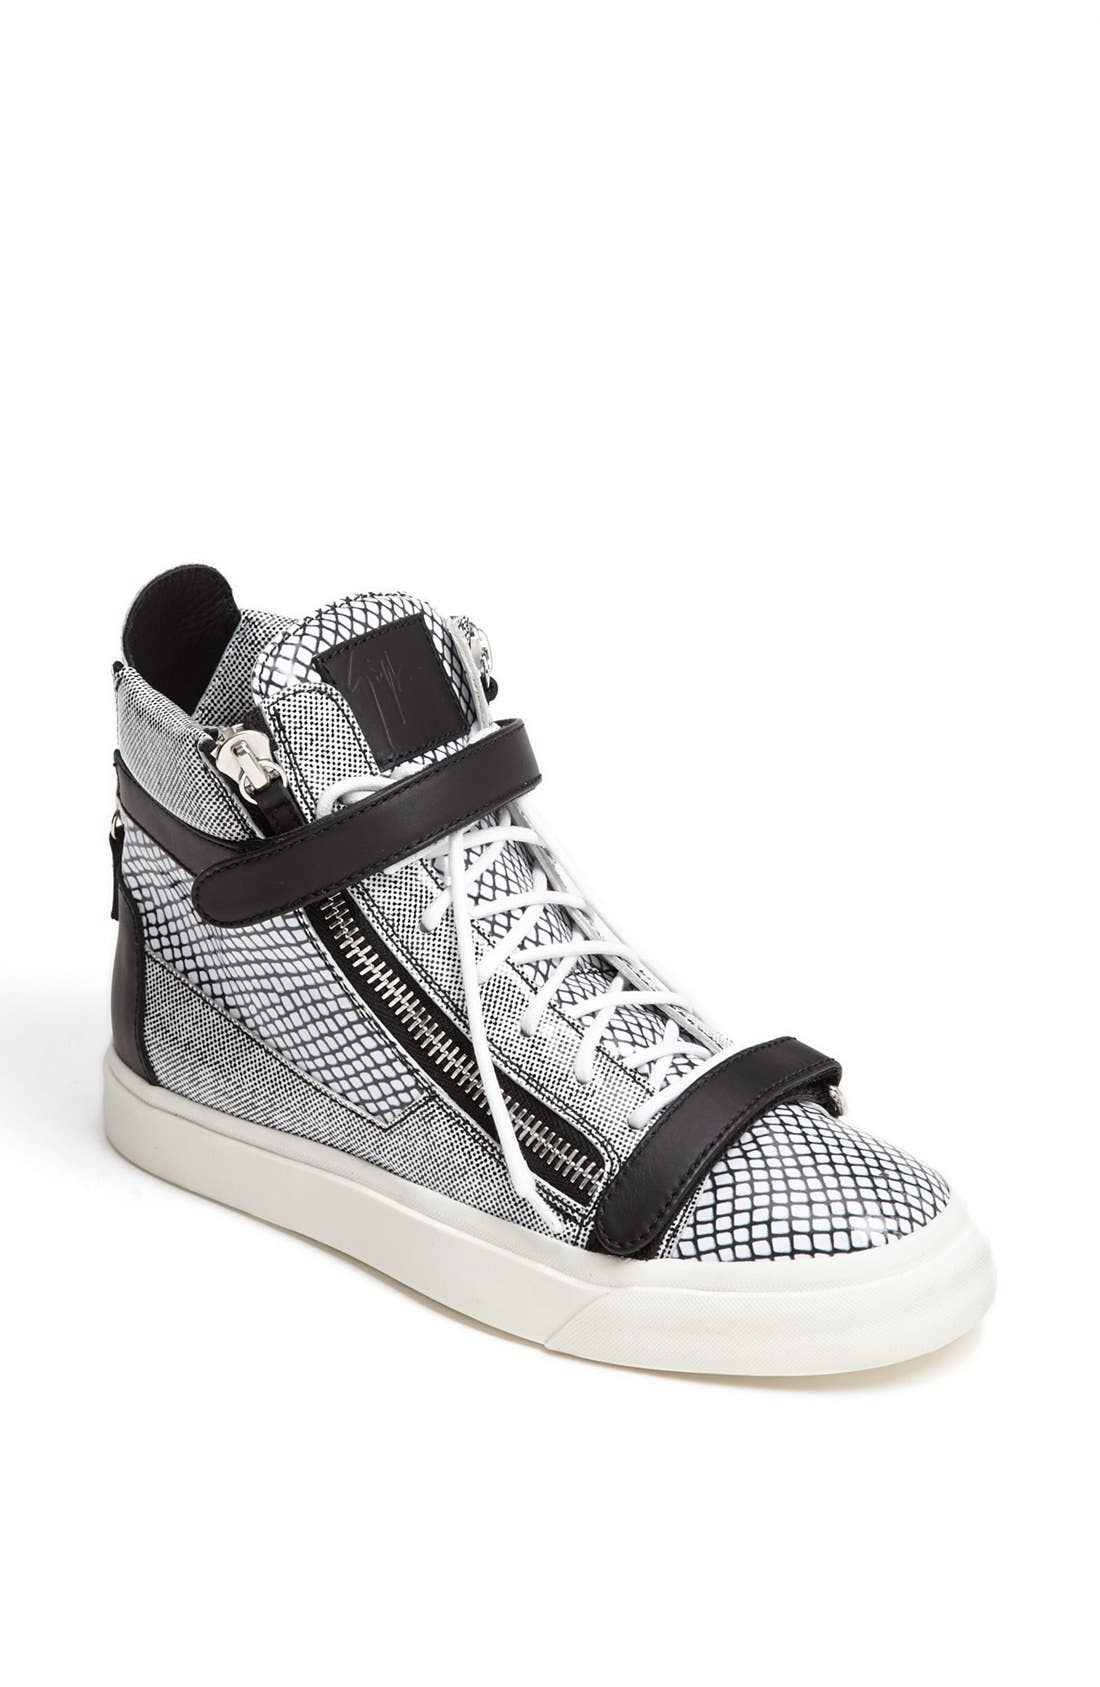 Main Image - Giuseppe Zanotti High Top Sneaker